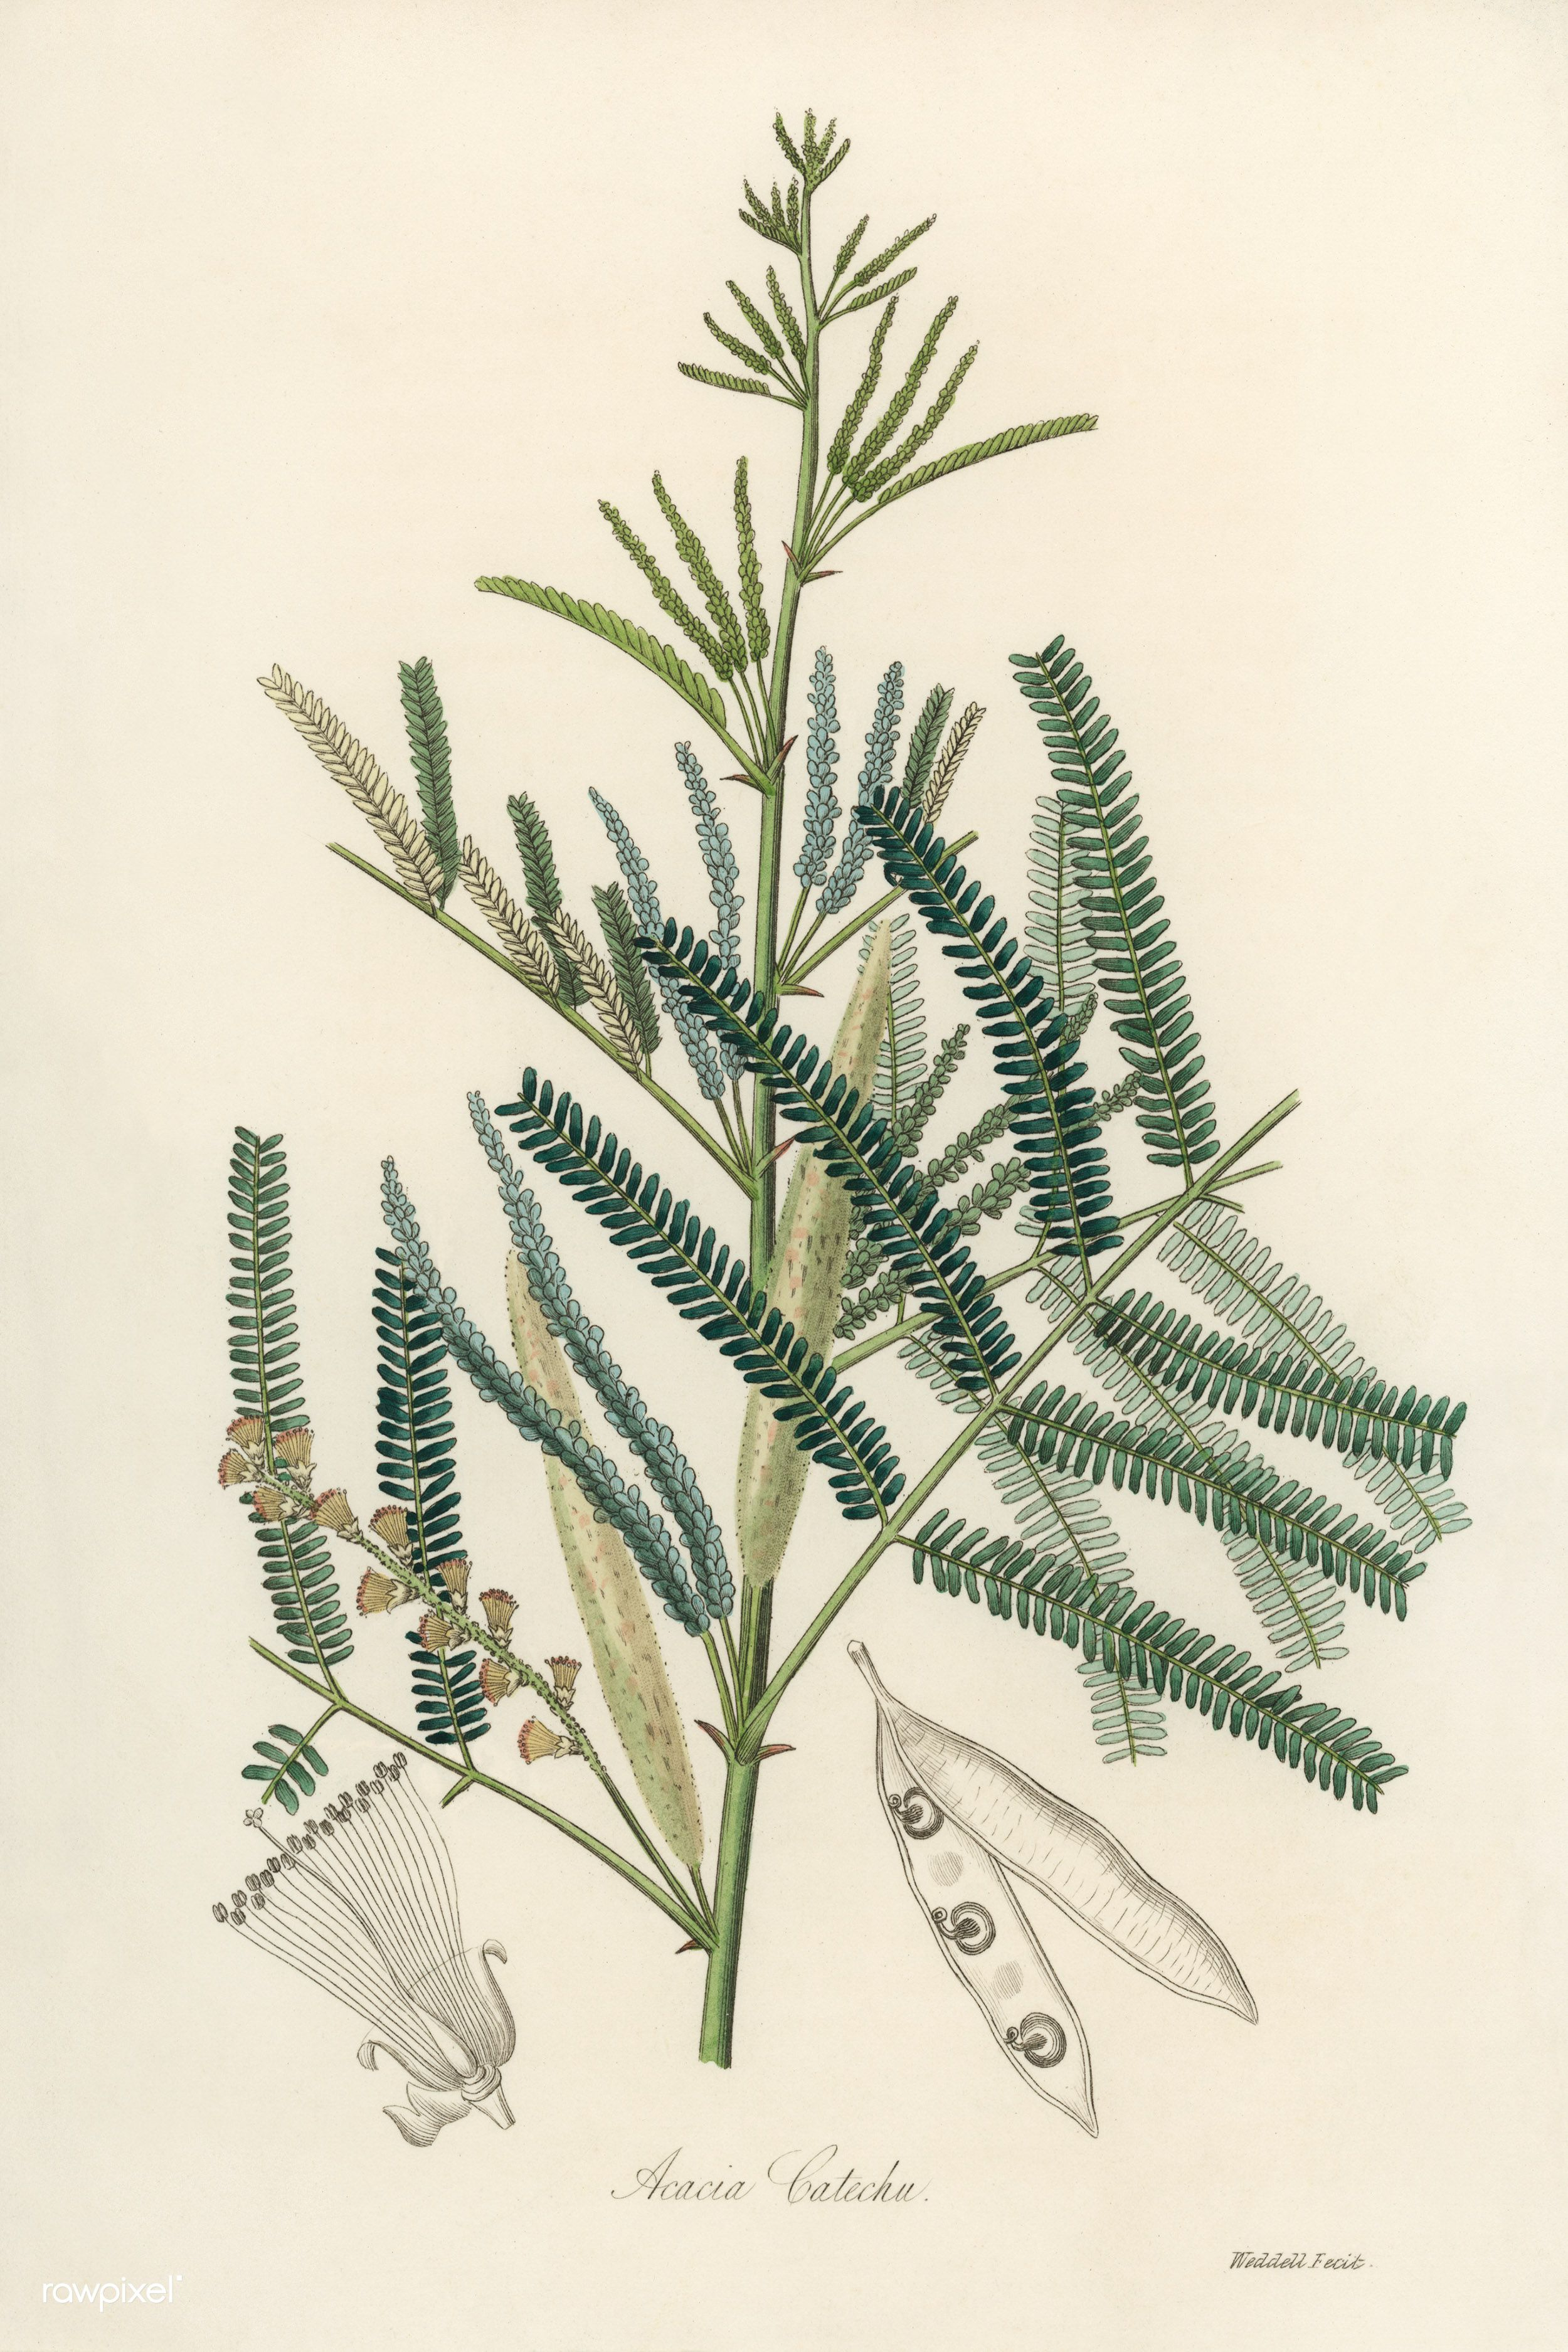 Antique Illustration Of Acacia Catechu 27104973727 O Flowers Plants Botany Vintage Retro Paintings Antique Illustration Illustration Free Illustrations